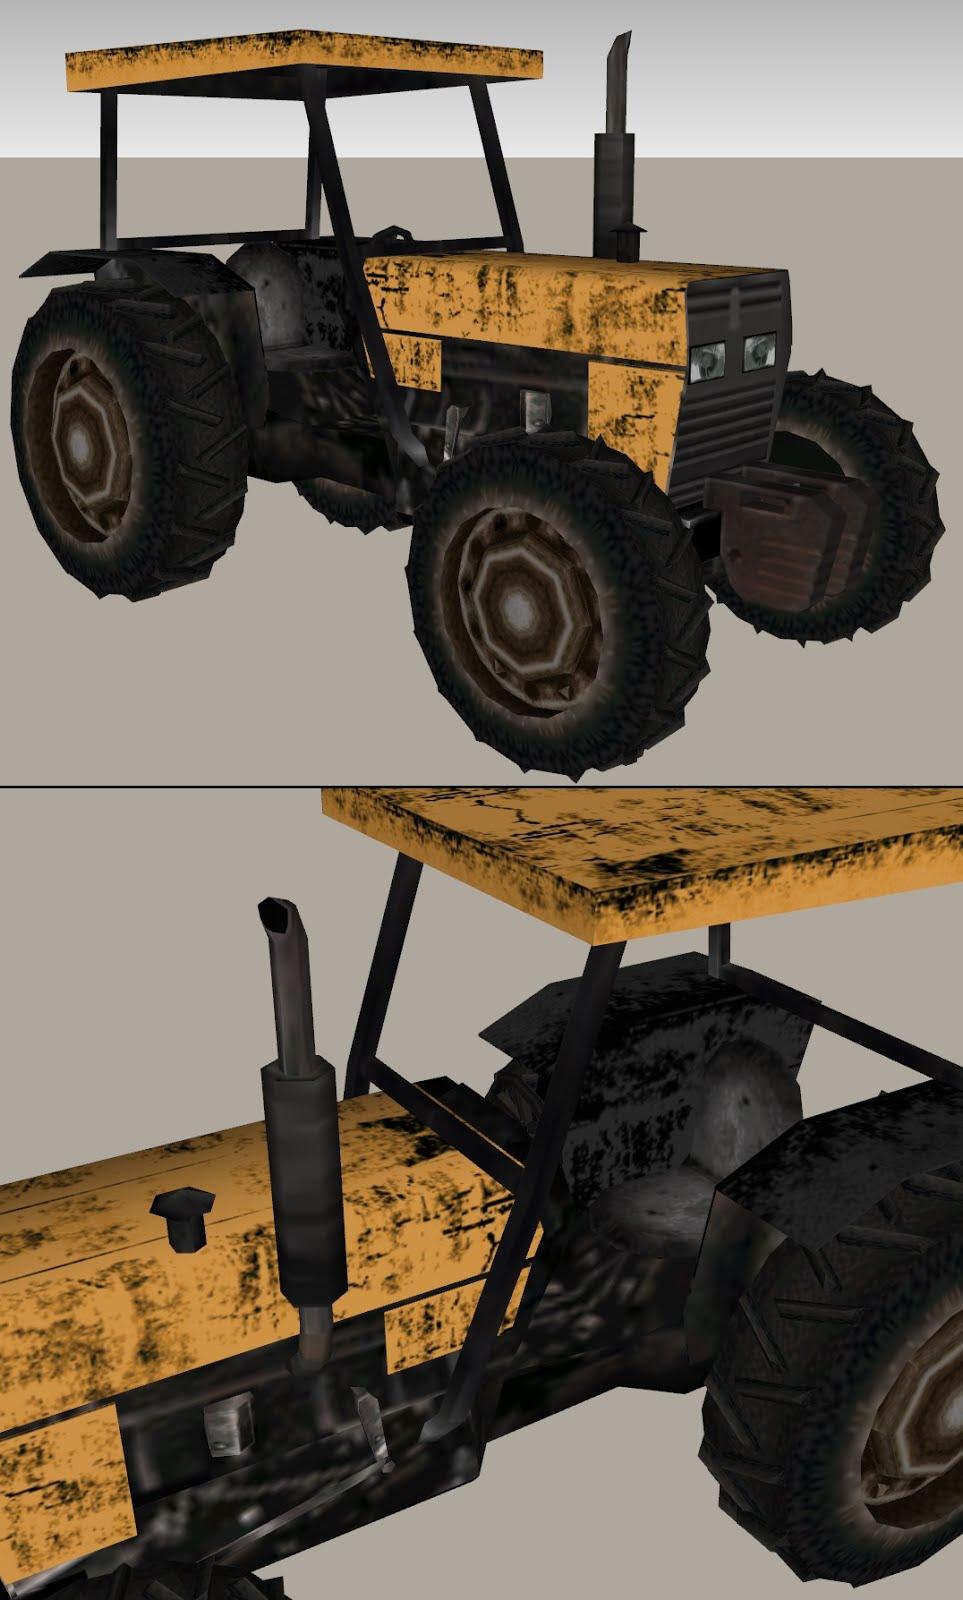 GTA Brasil (O verdadeiro GTA Brasileiro) - Dev - Página 8 Gta-sa-mod-tractor-trator-valmet-valtra